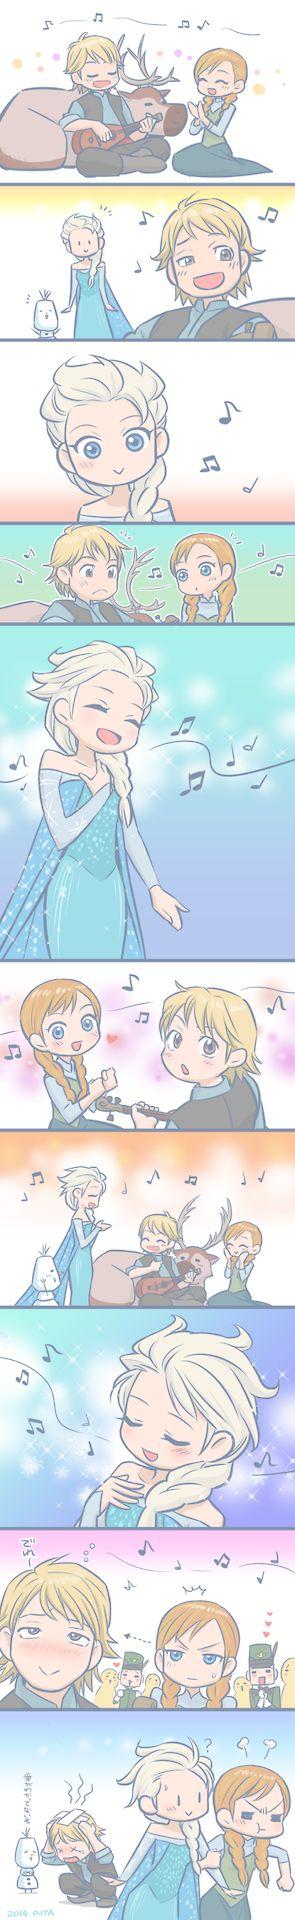 Kristelsa - Elsa's singing Cute, but not shipping it.